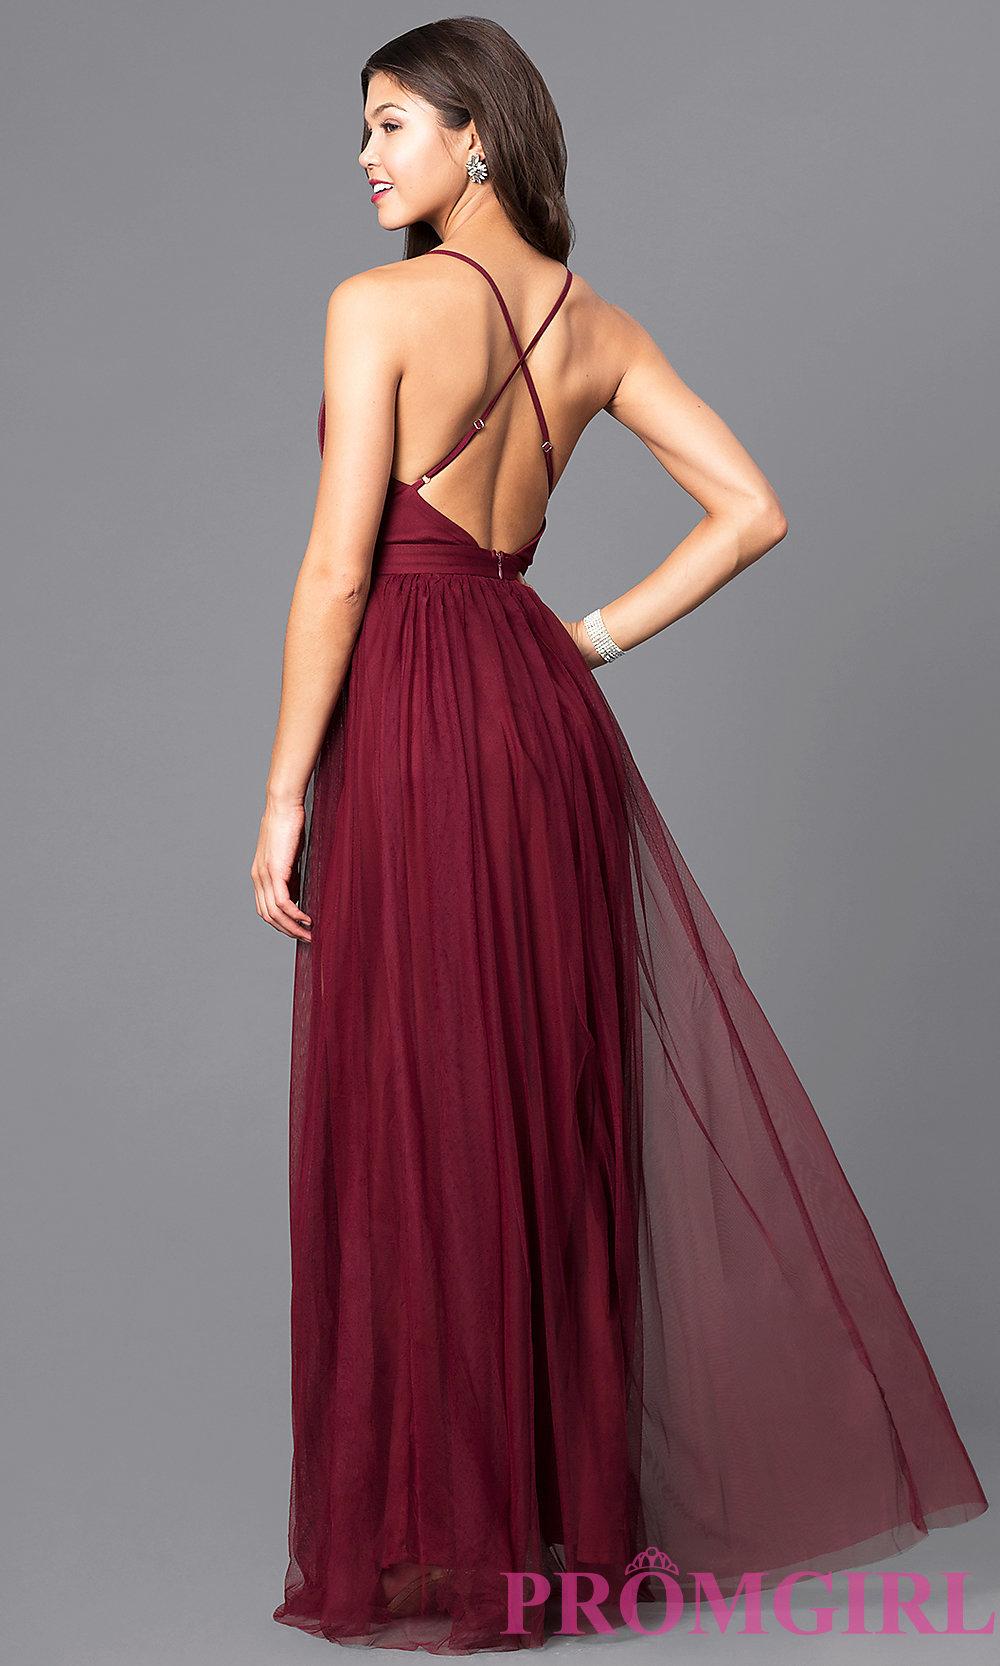 9e169a2b70b Flowy A-line V-neck Burgundy Tulle Ball Dress with Side Slit ...